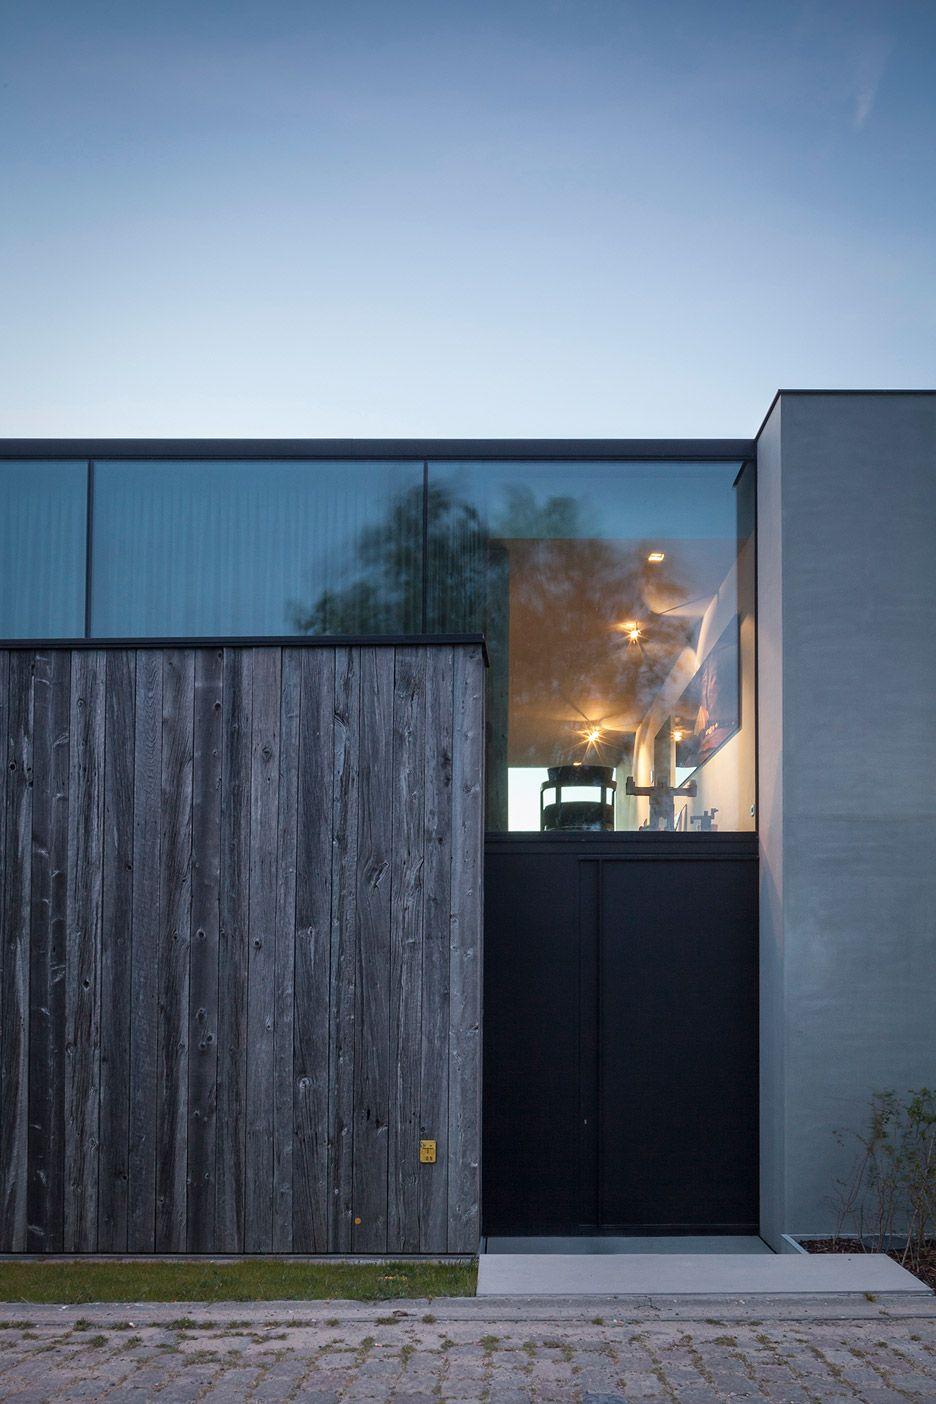 House Graafjansdijk by Govaert Vanhoutte architects